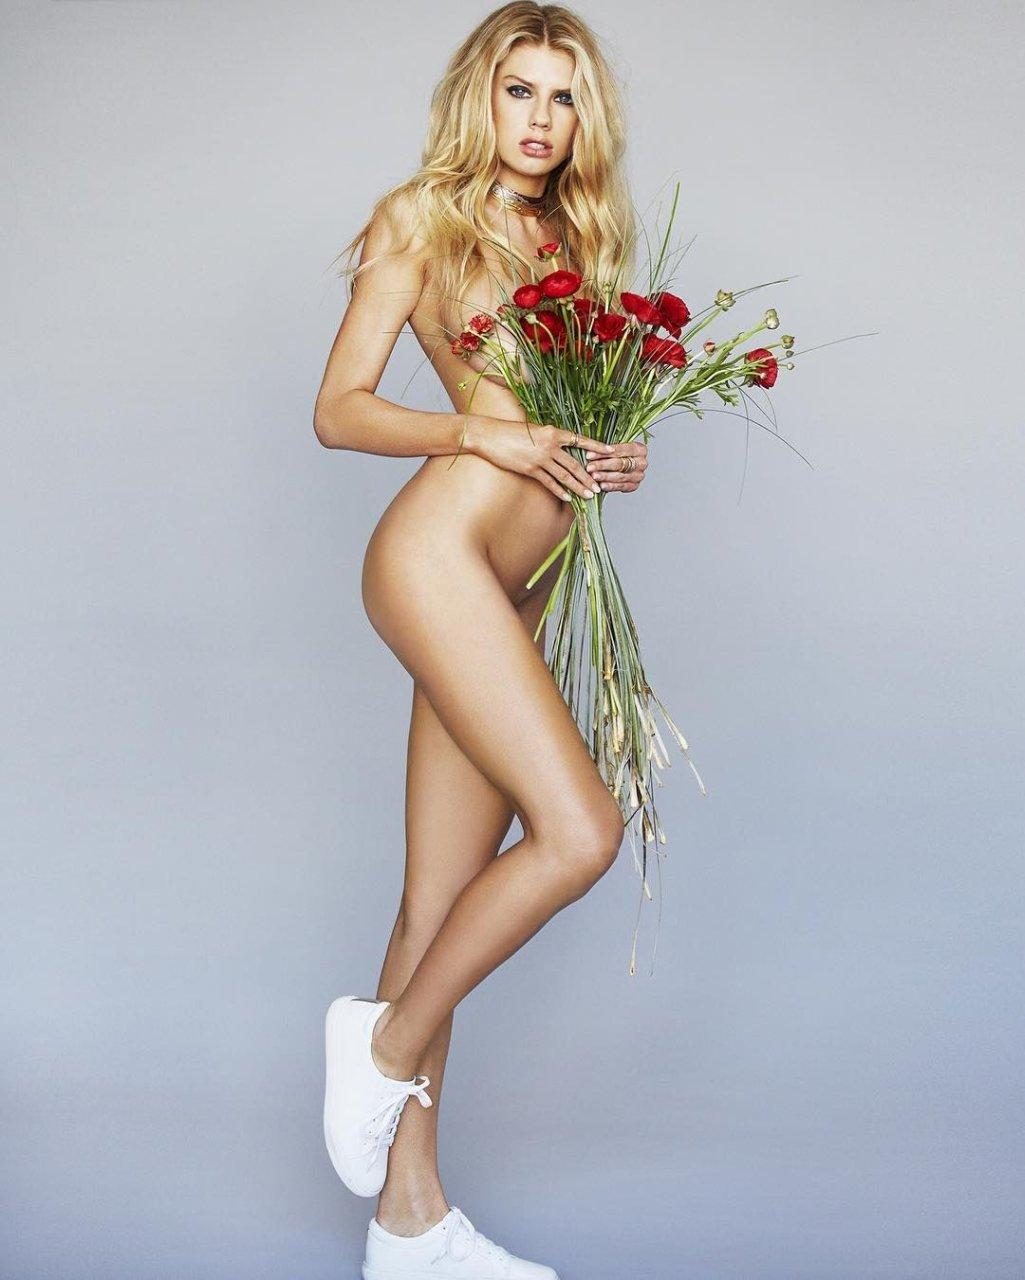 Nudes of charlotte mckinney